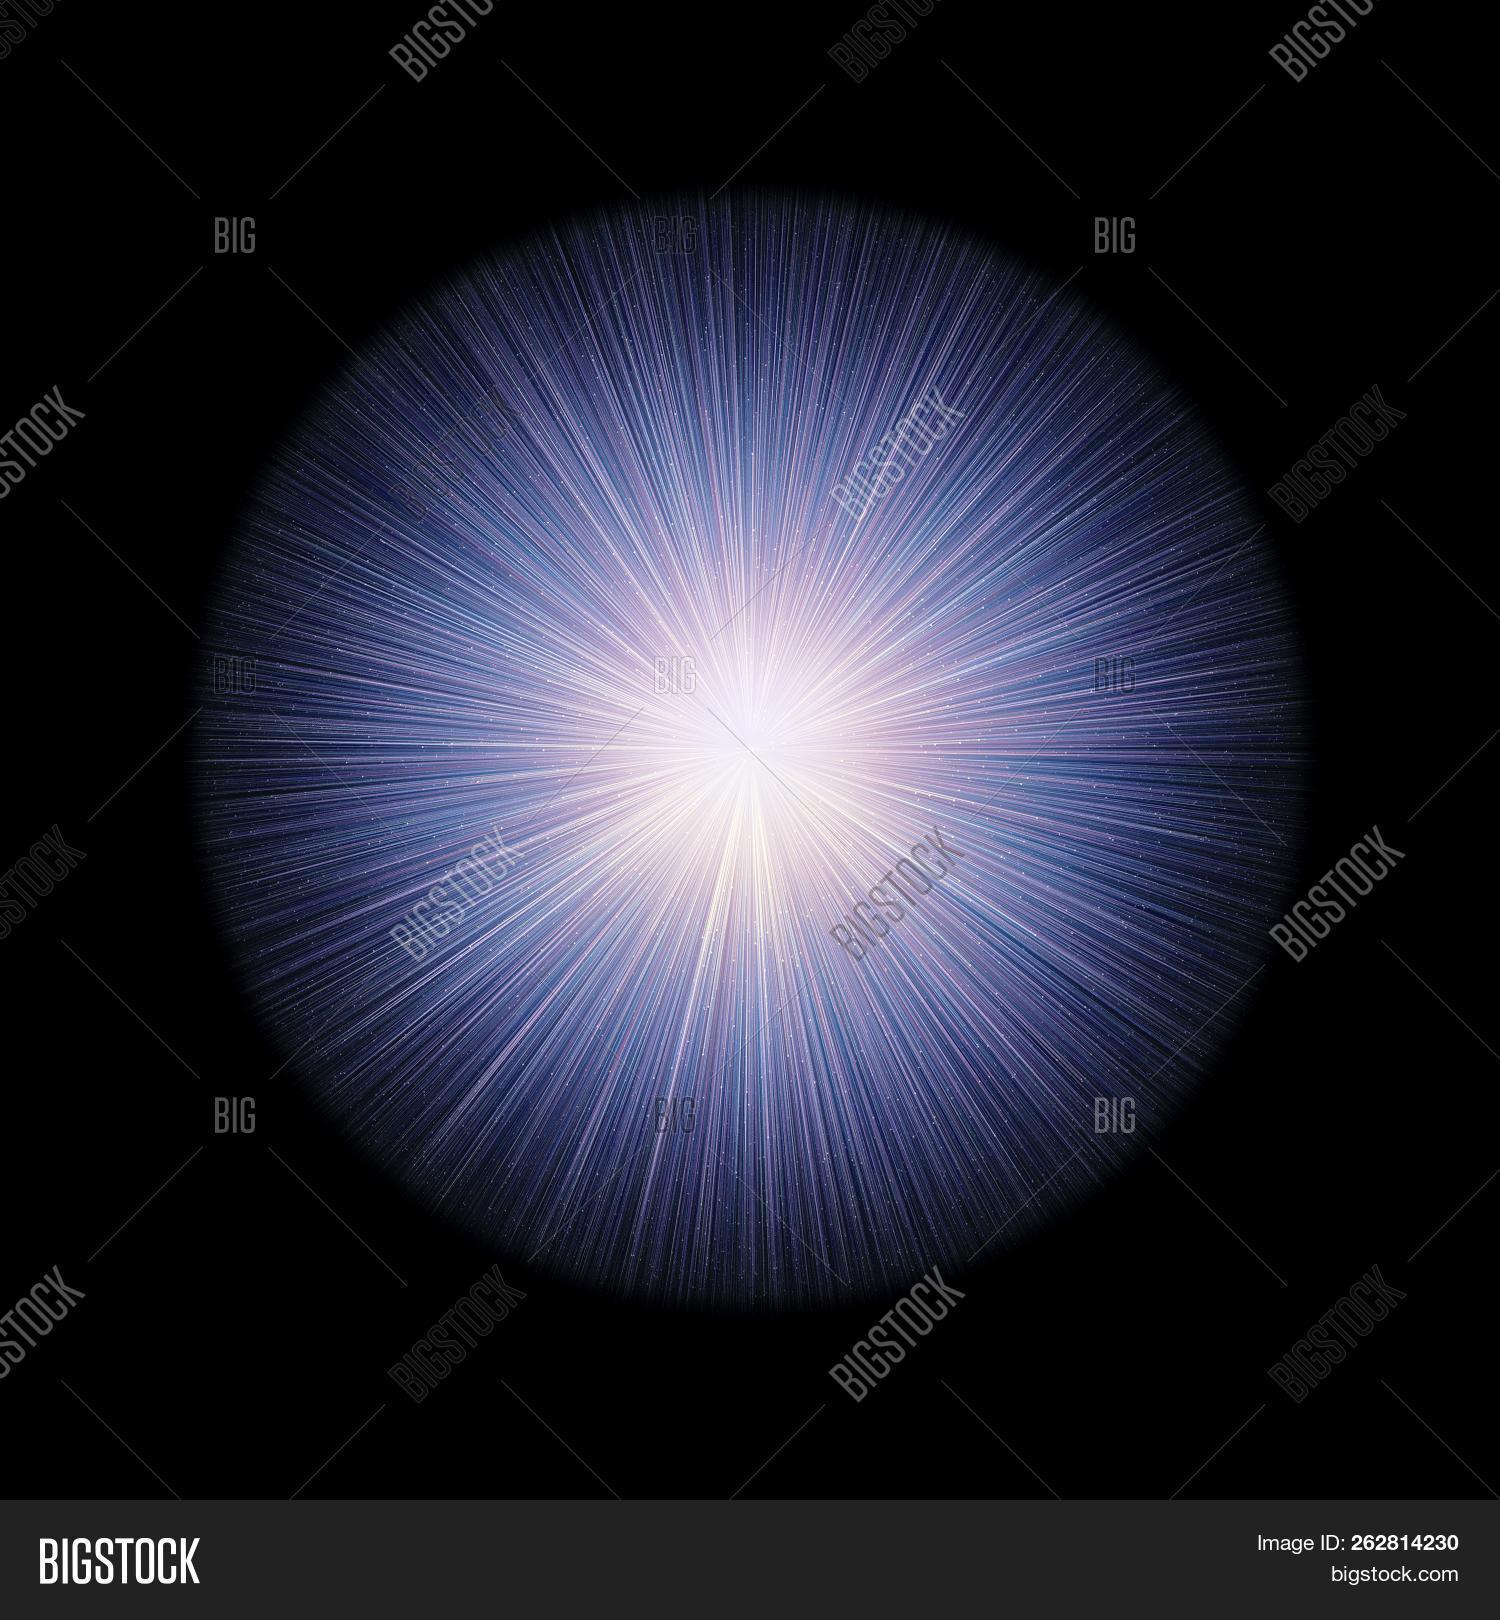 Glowing Orb Rays Light Image Photo